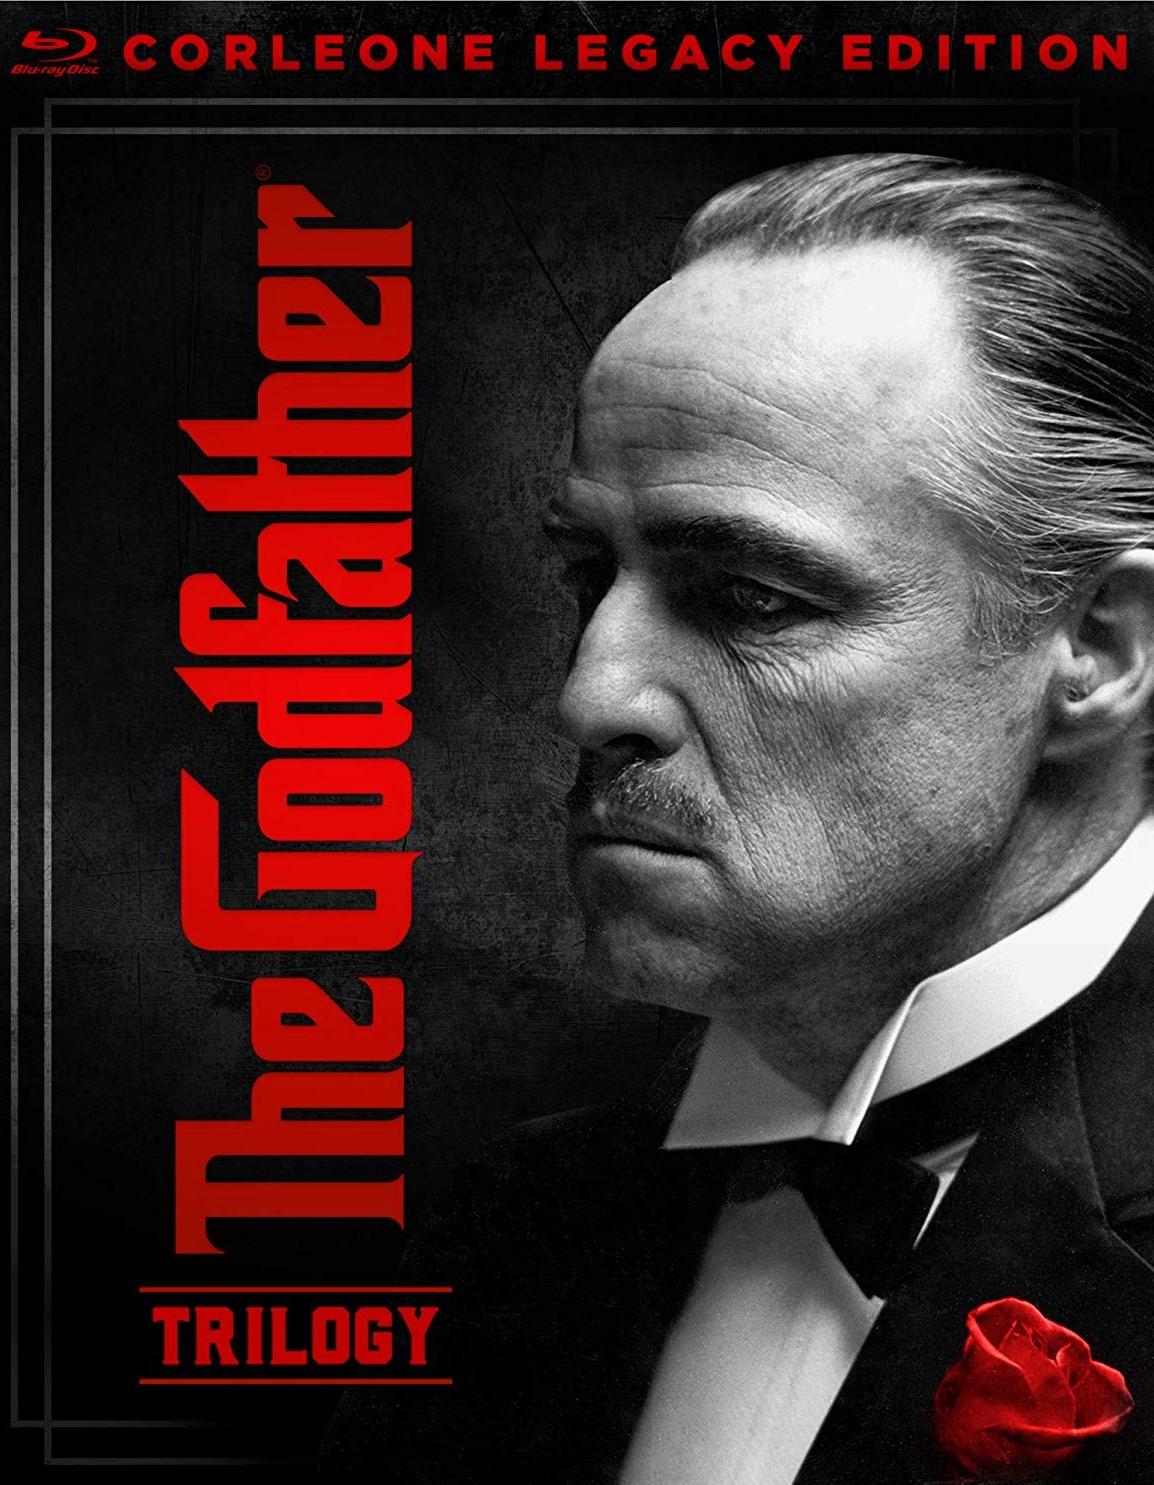 THE GODFATHER TRILOGY CORLEONE LEGACY EDITION Blu,ray